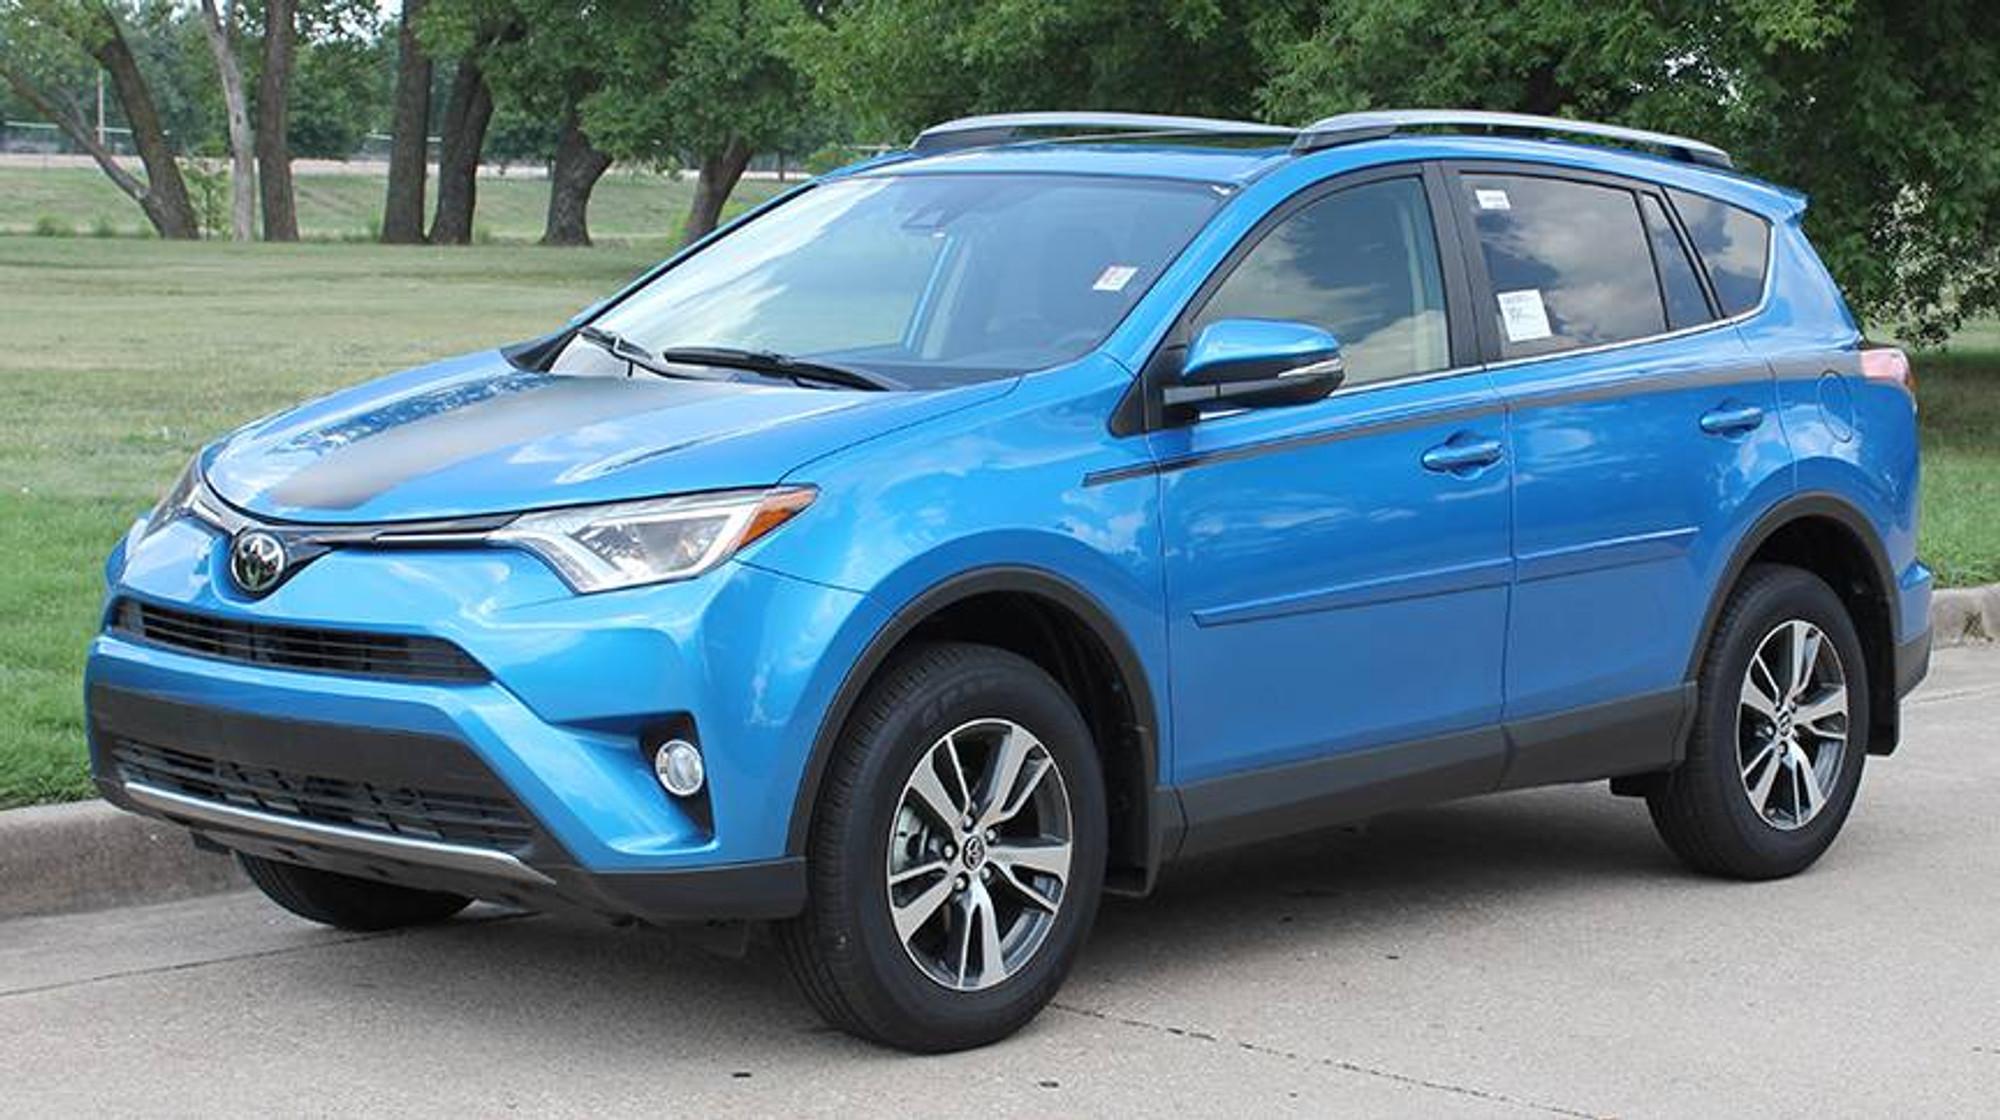 Toyota rav 4 vehicle wraps auto graphics stripeman